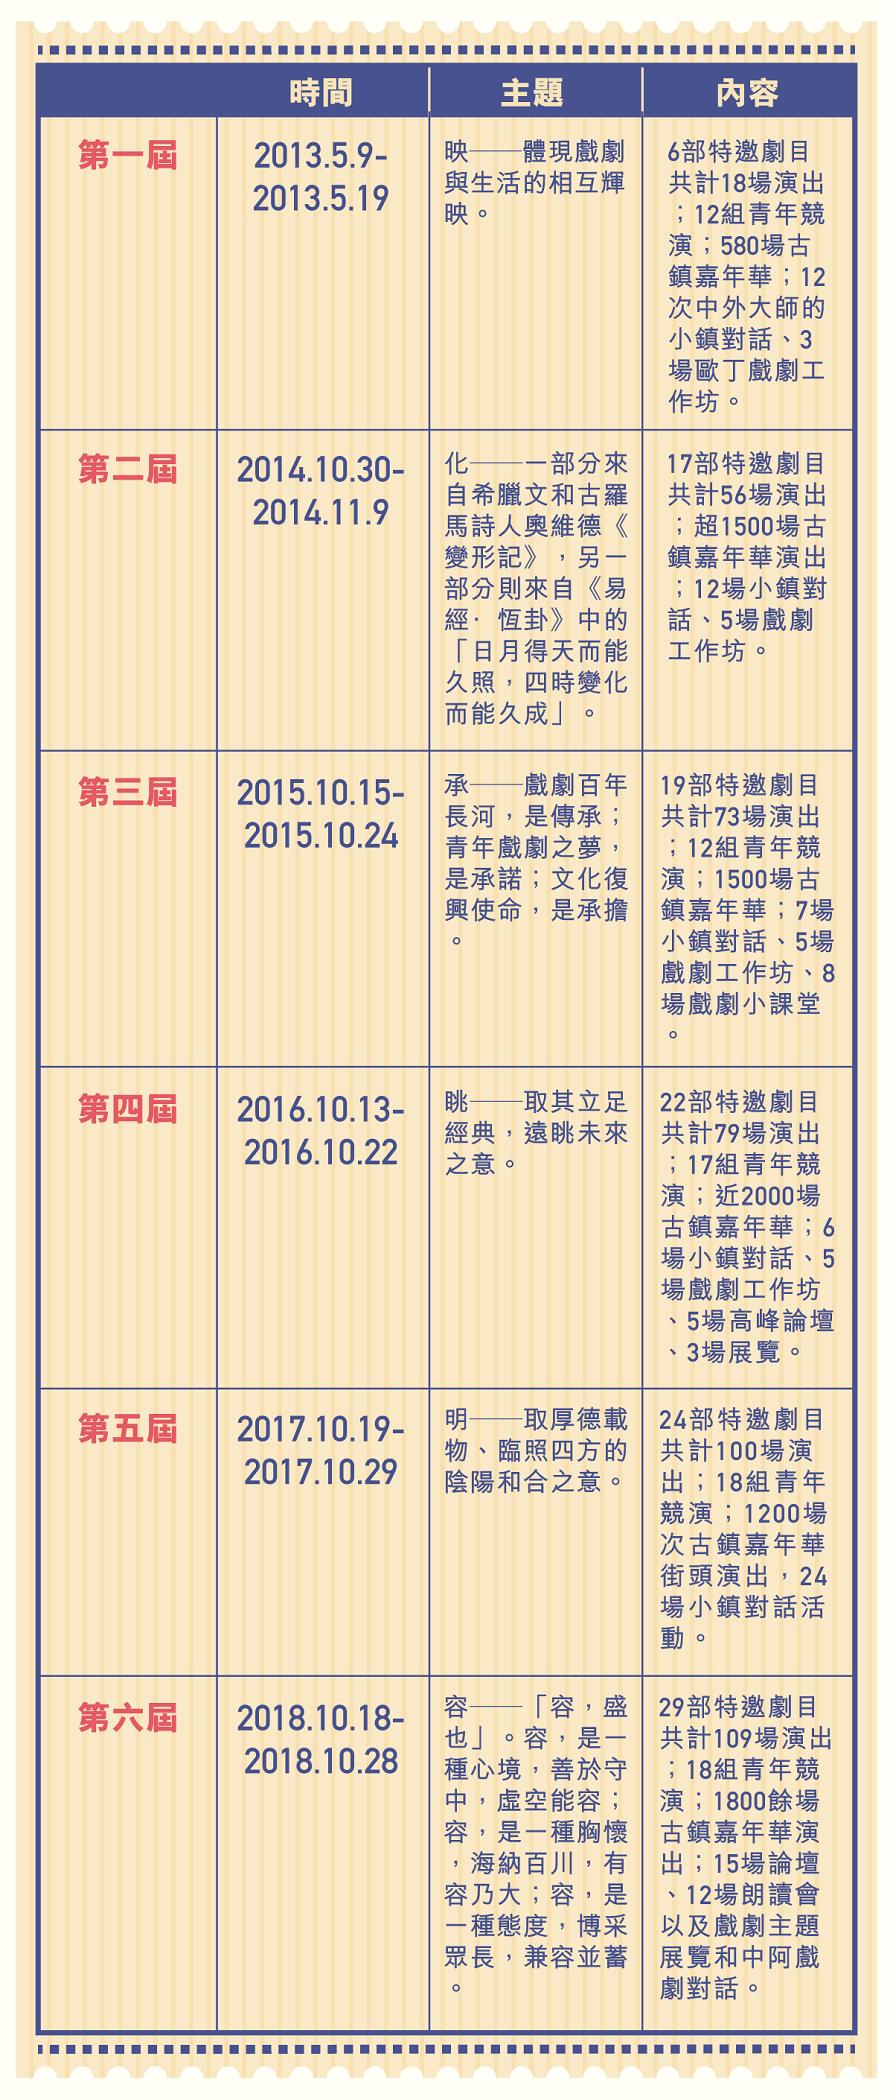 main_site_illustrationwuzhenxijujie_v3-02